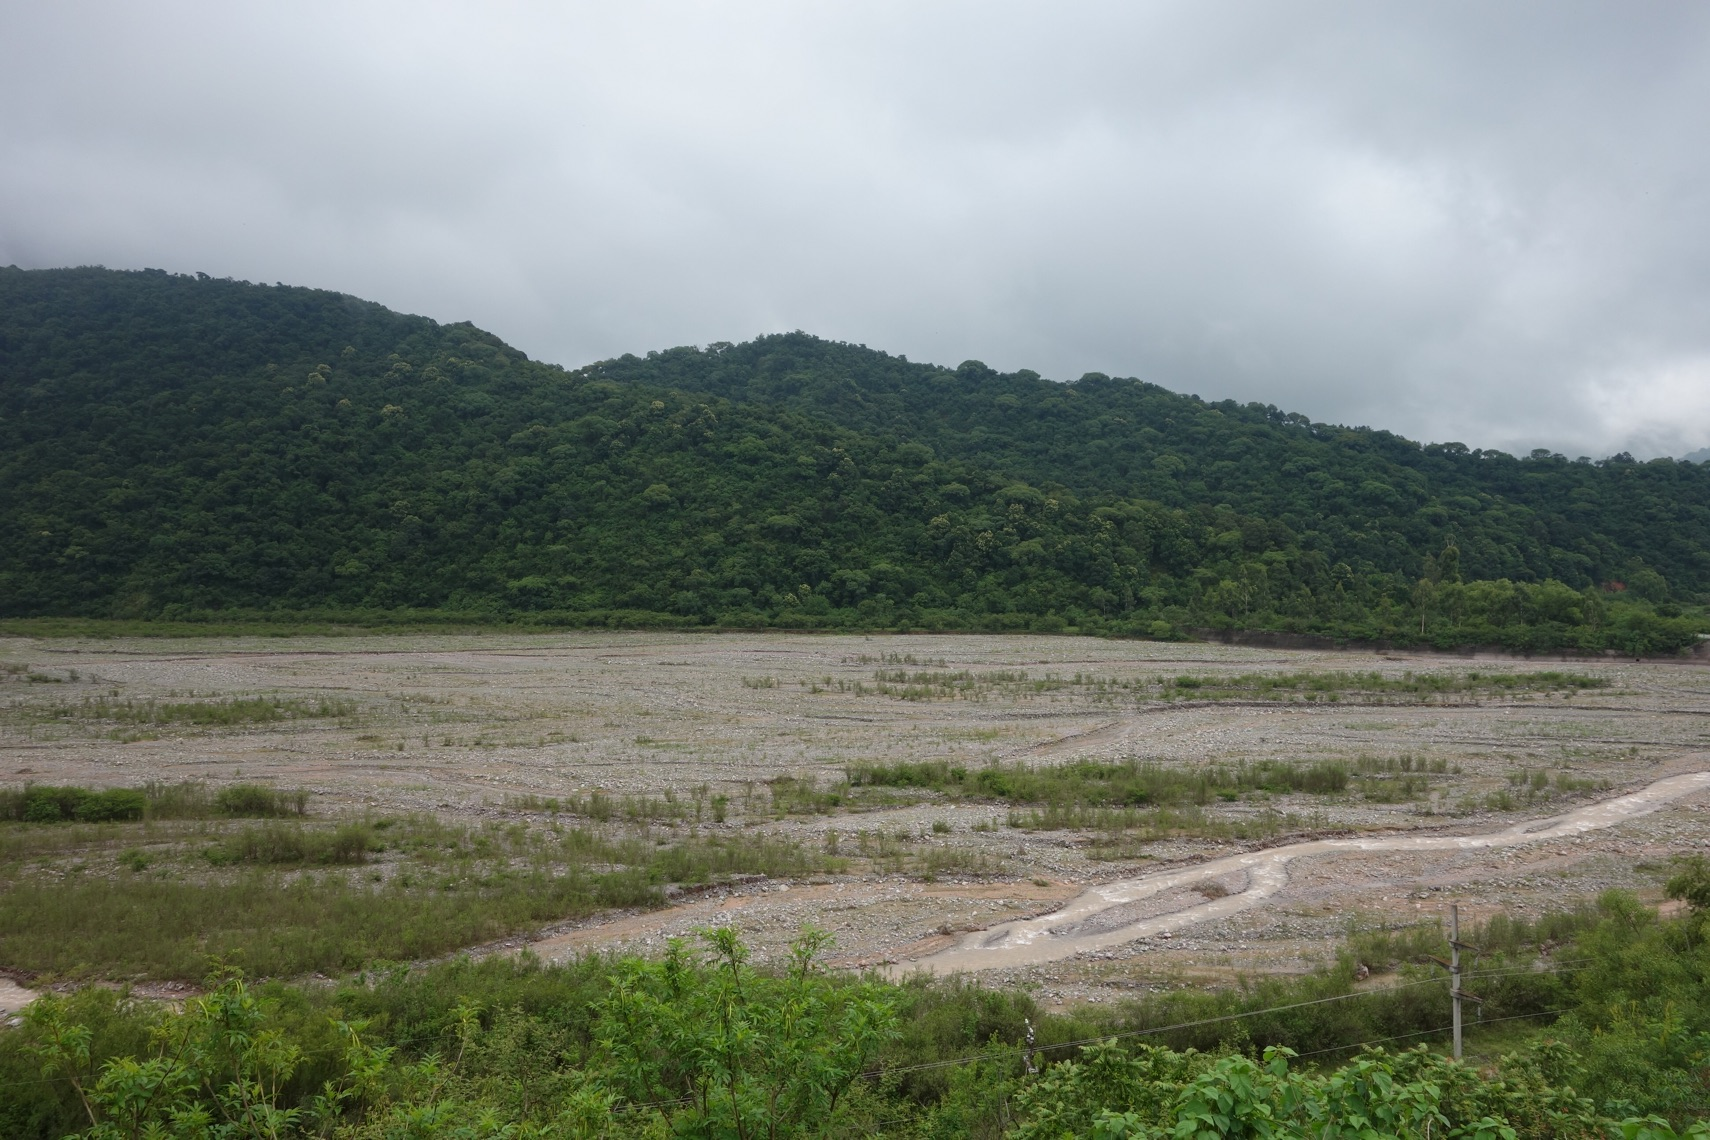 Rio grande Tal